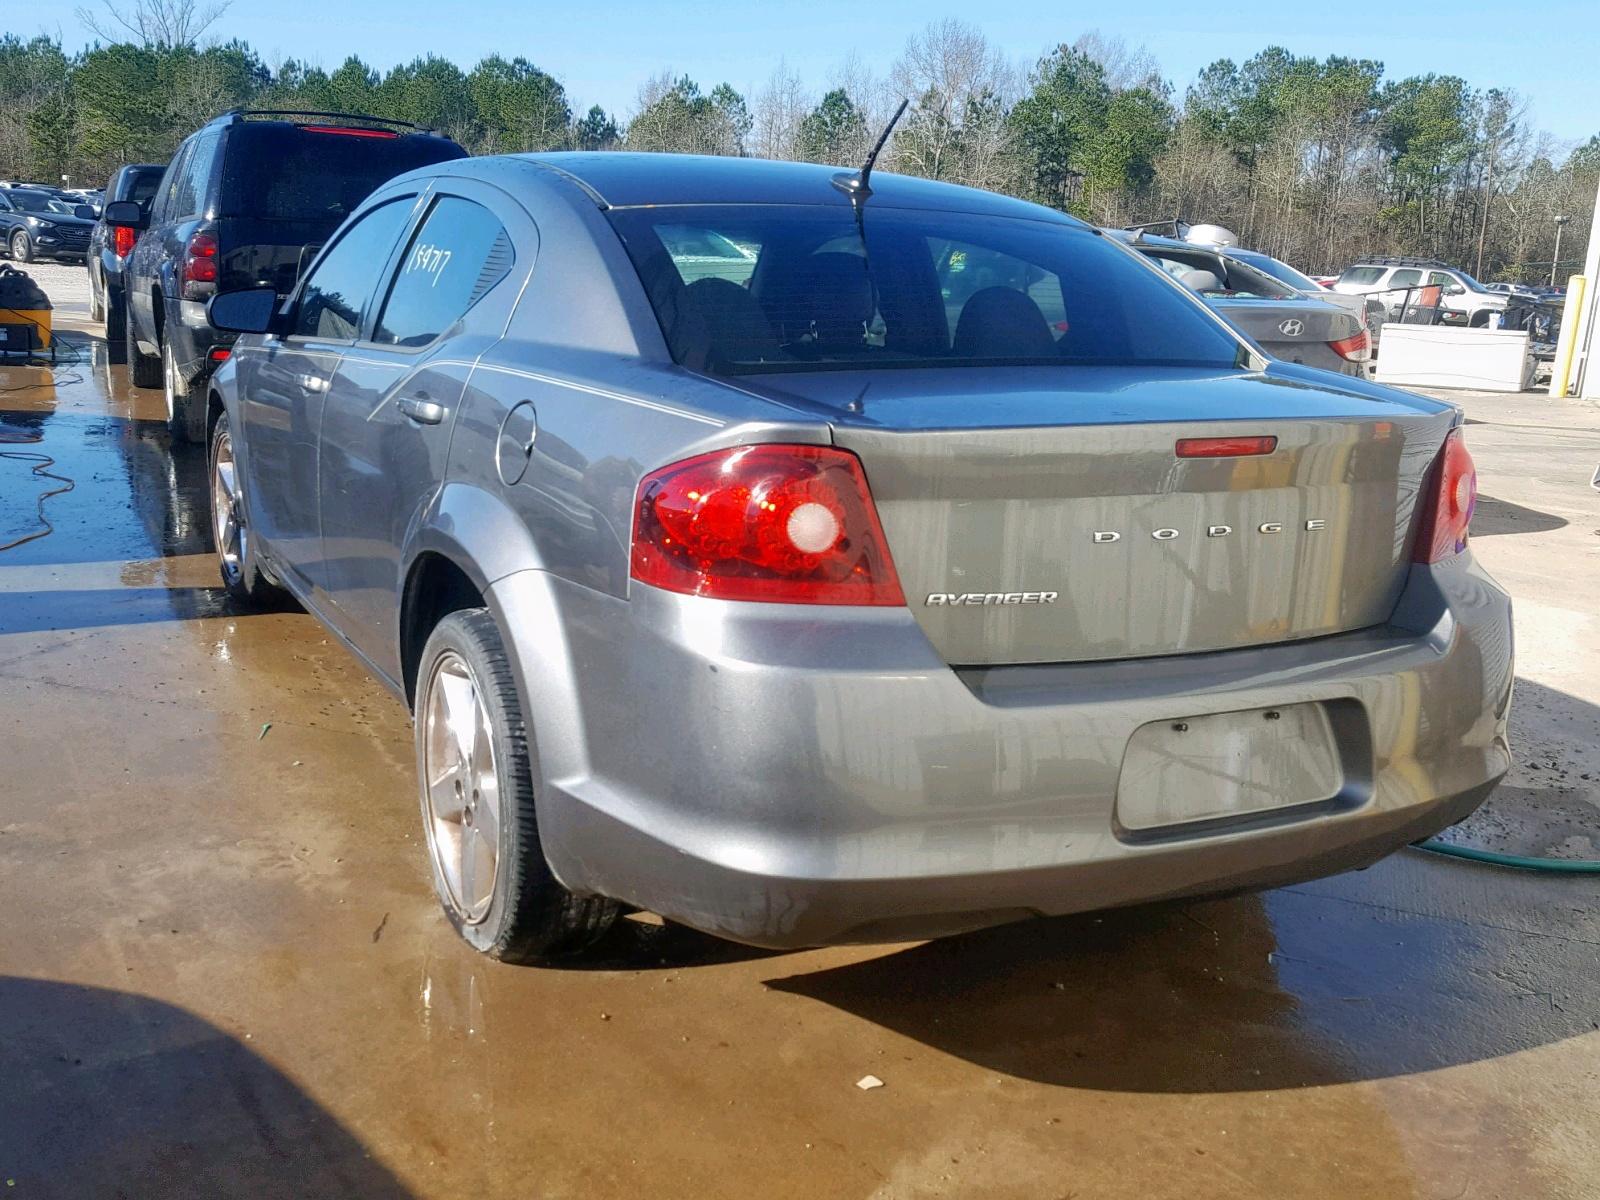 1C3CDZAB9CN148889 - 2012 Dodge Avenger Se 2.4L [Angle] View